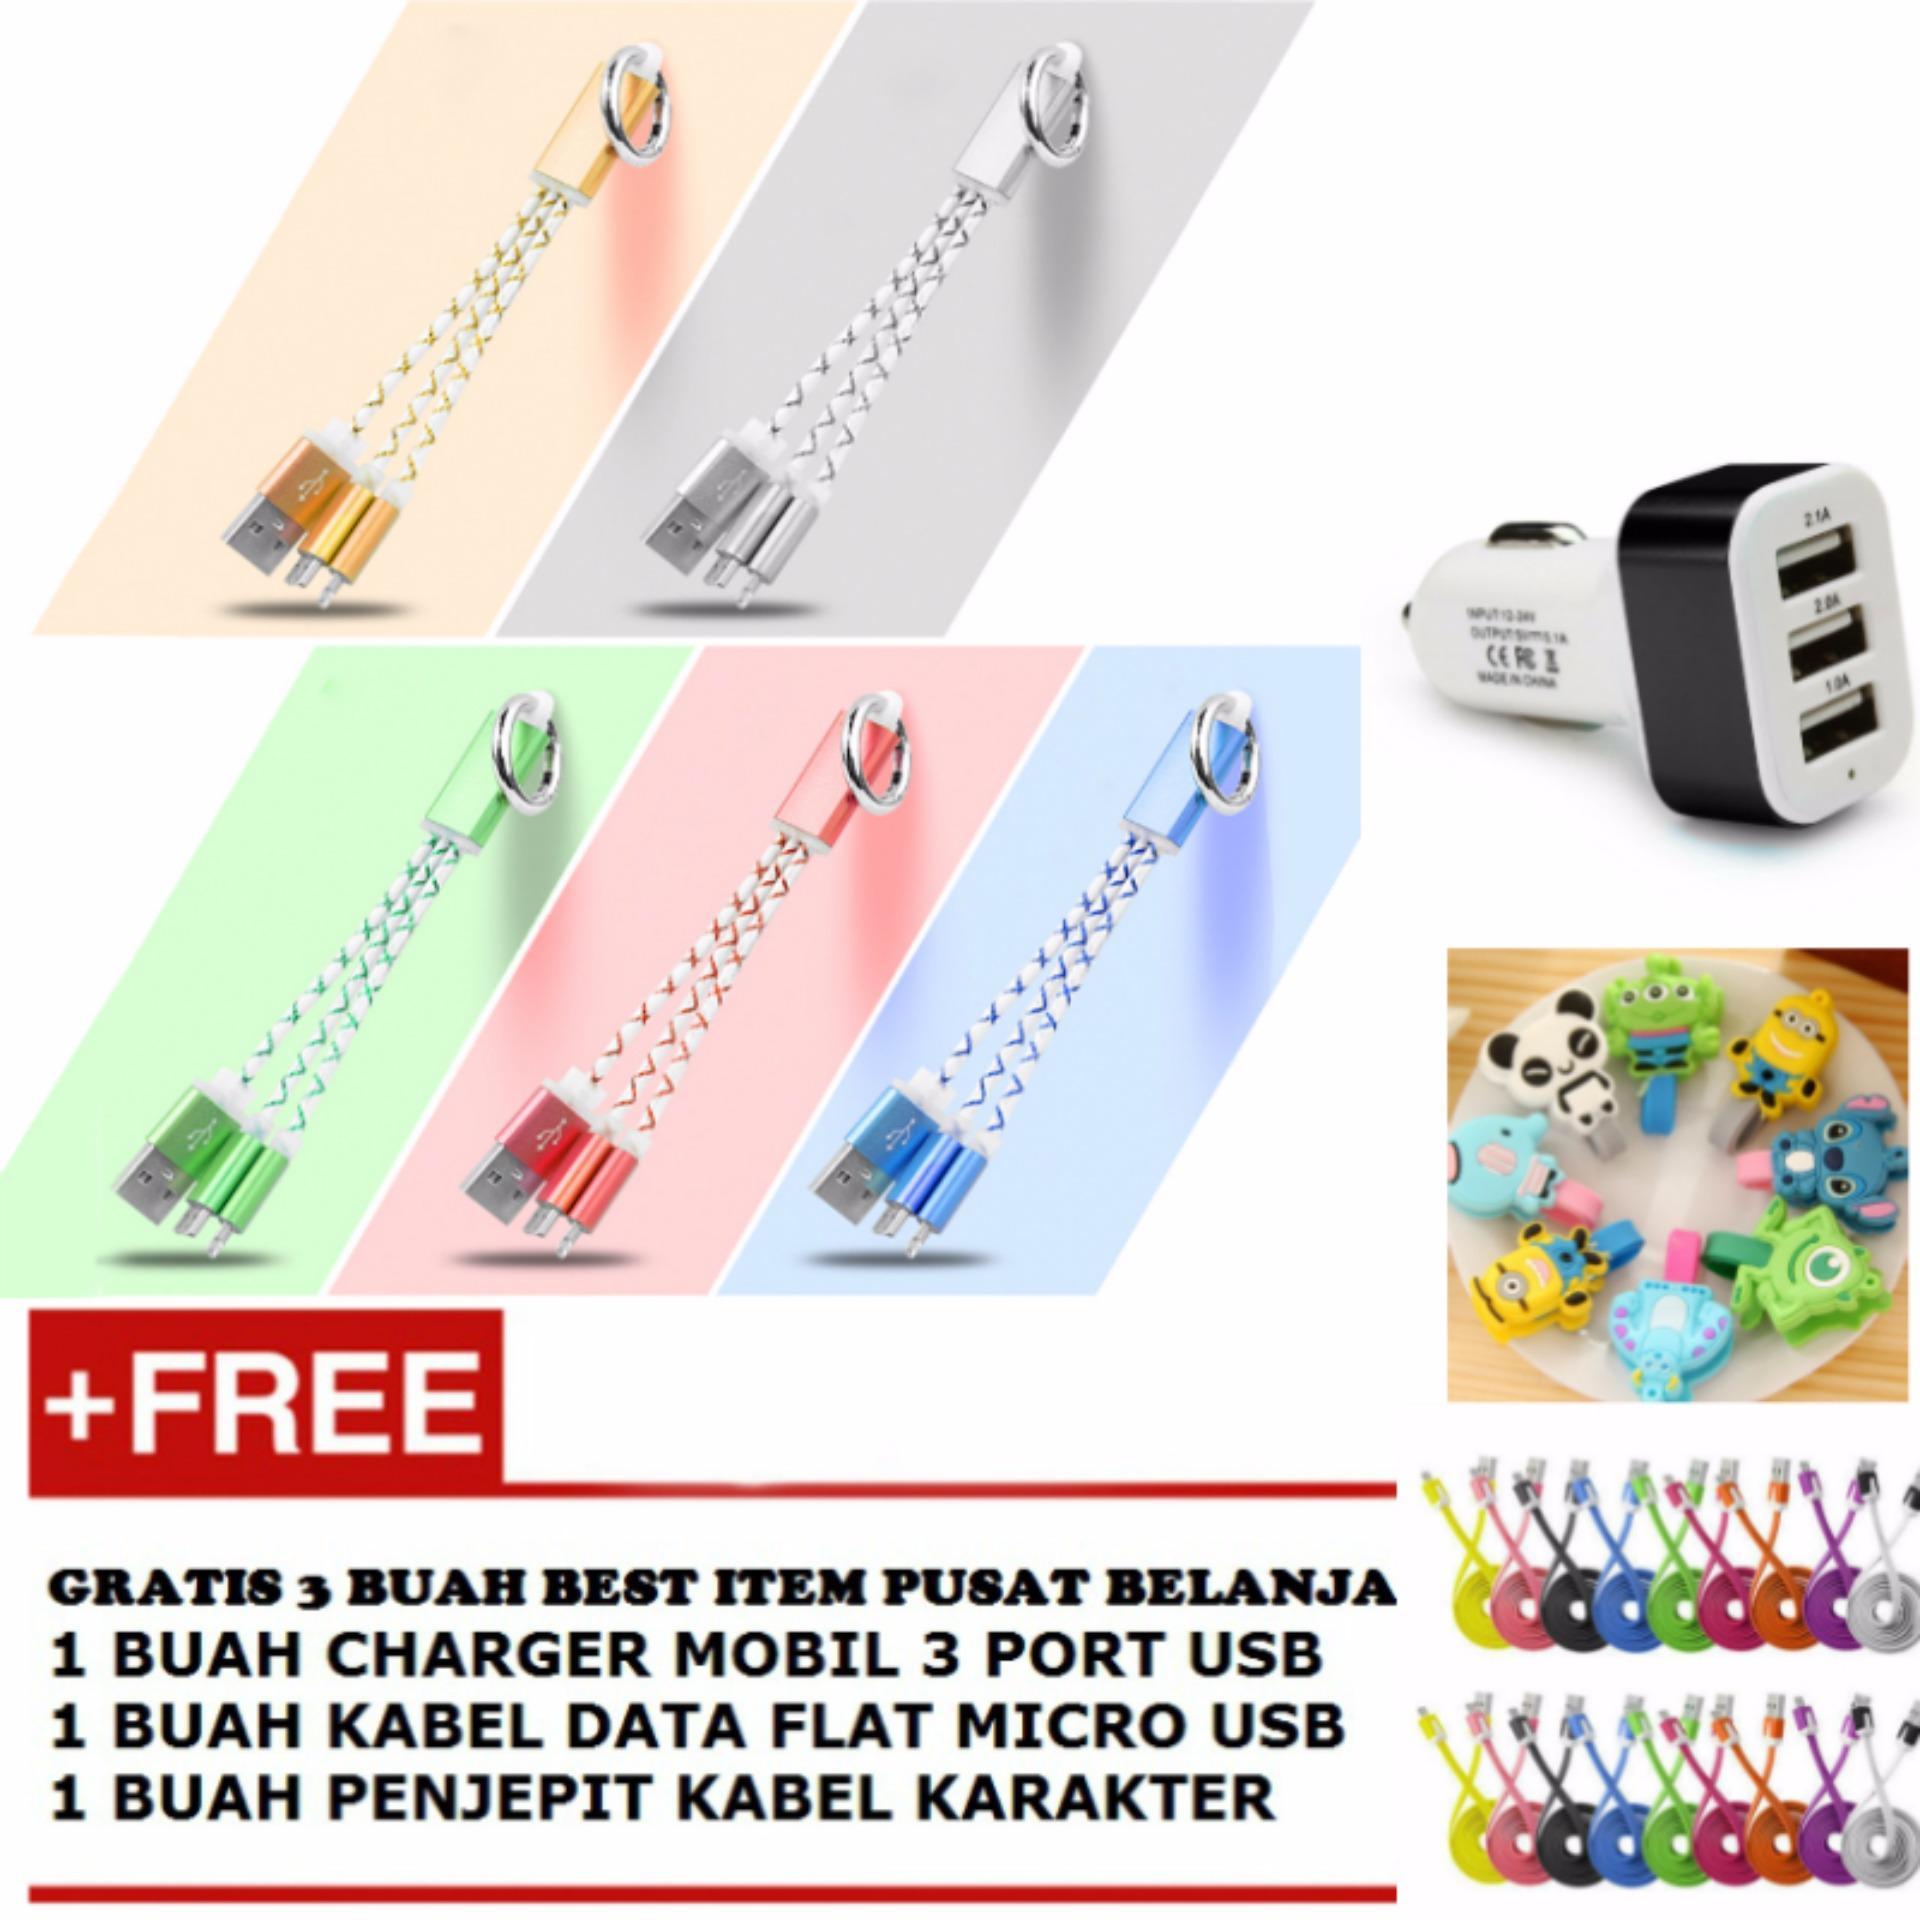 ... Kabel Data 2 in 1 15 cm - Multicolour + Gratis 1 Buah Charger Mobil3 Port ...